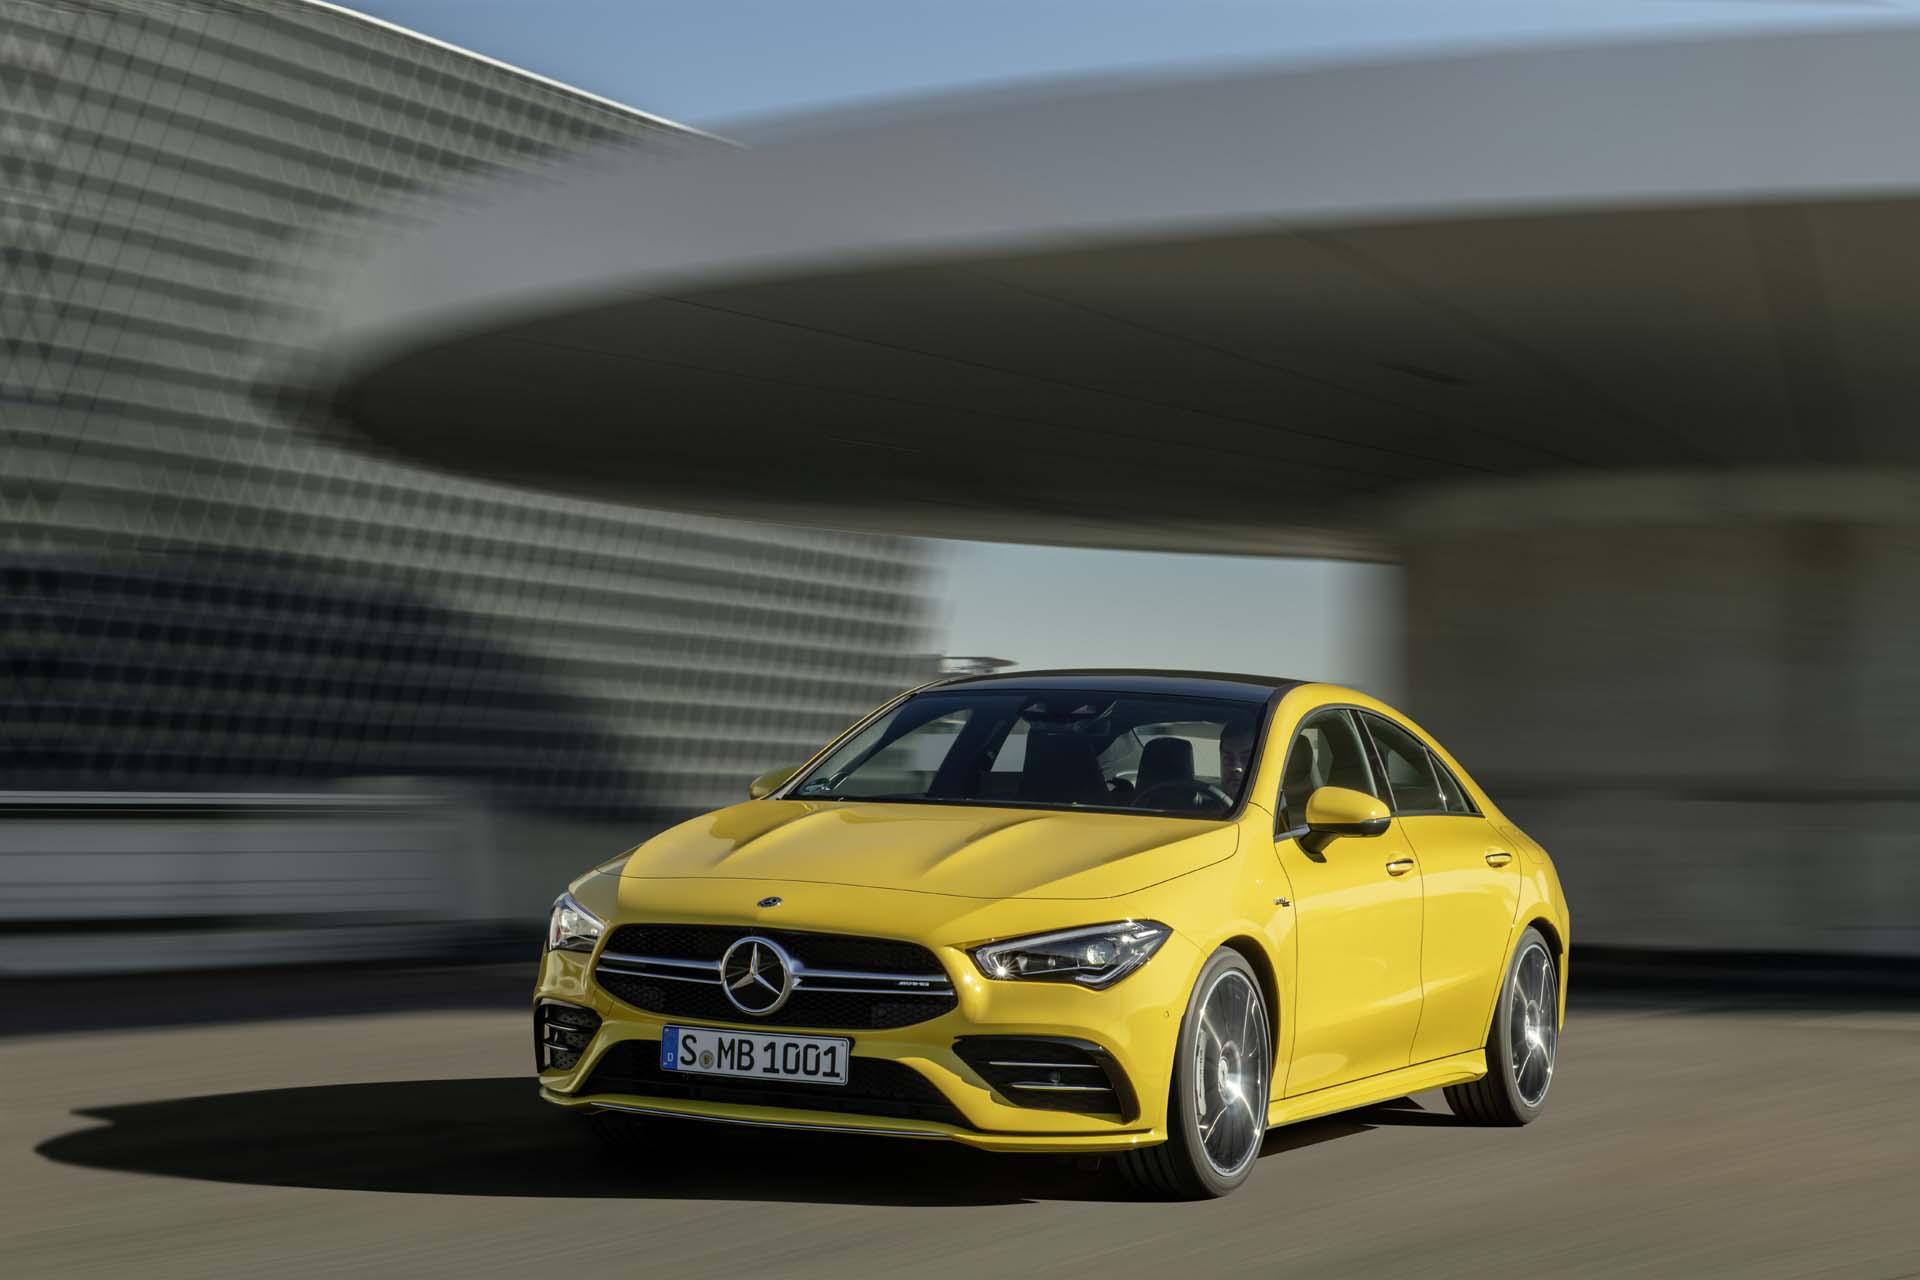 2020 Mercedes-Benz CLA35 AMG debuts: A stylish 302-hp firecracker